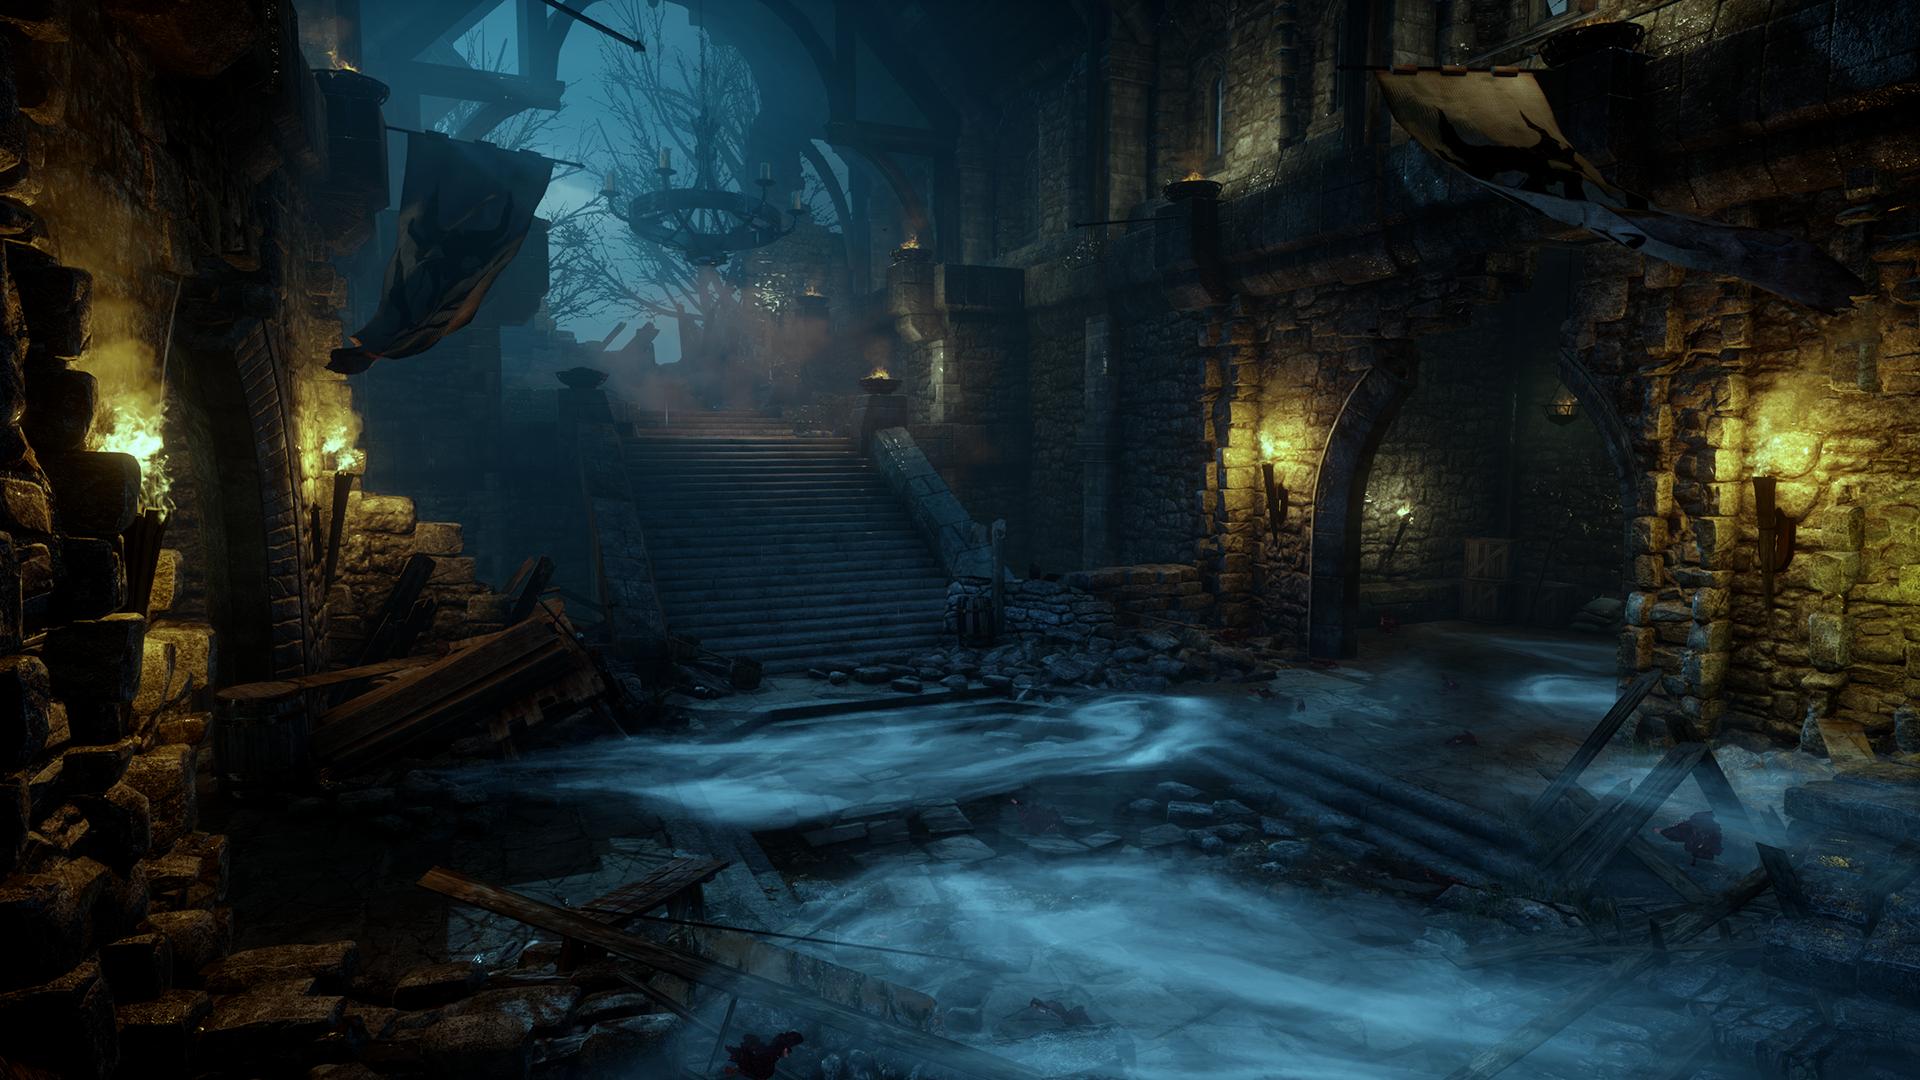 Wallpaper Video Games Dragon Age Dragon Age Inquisition